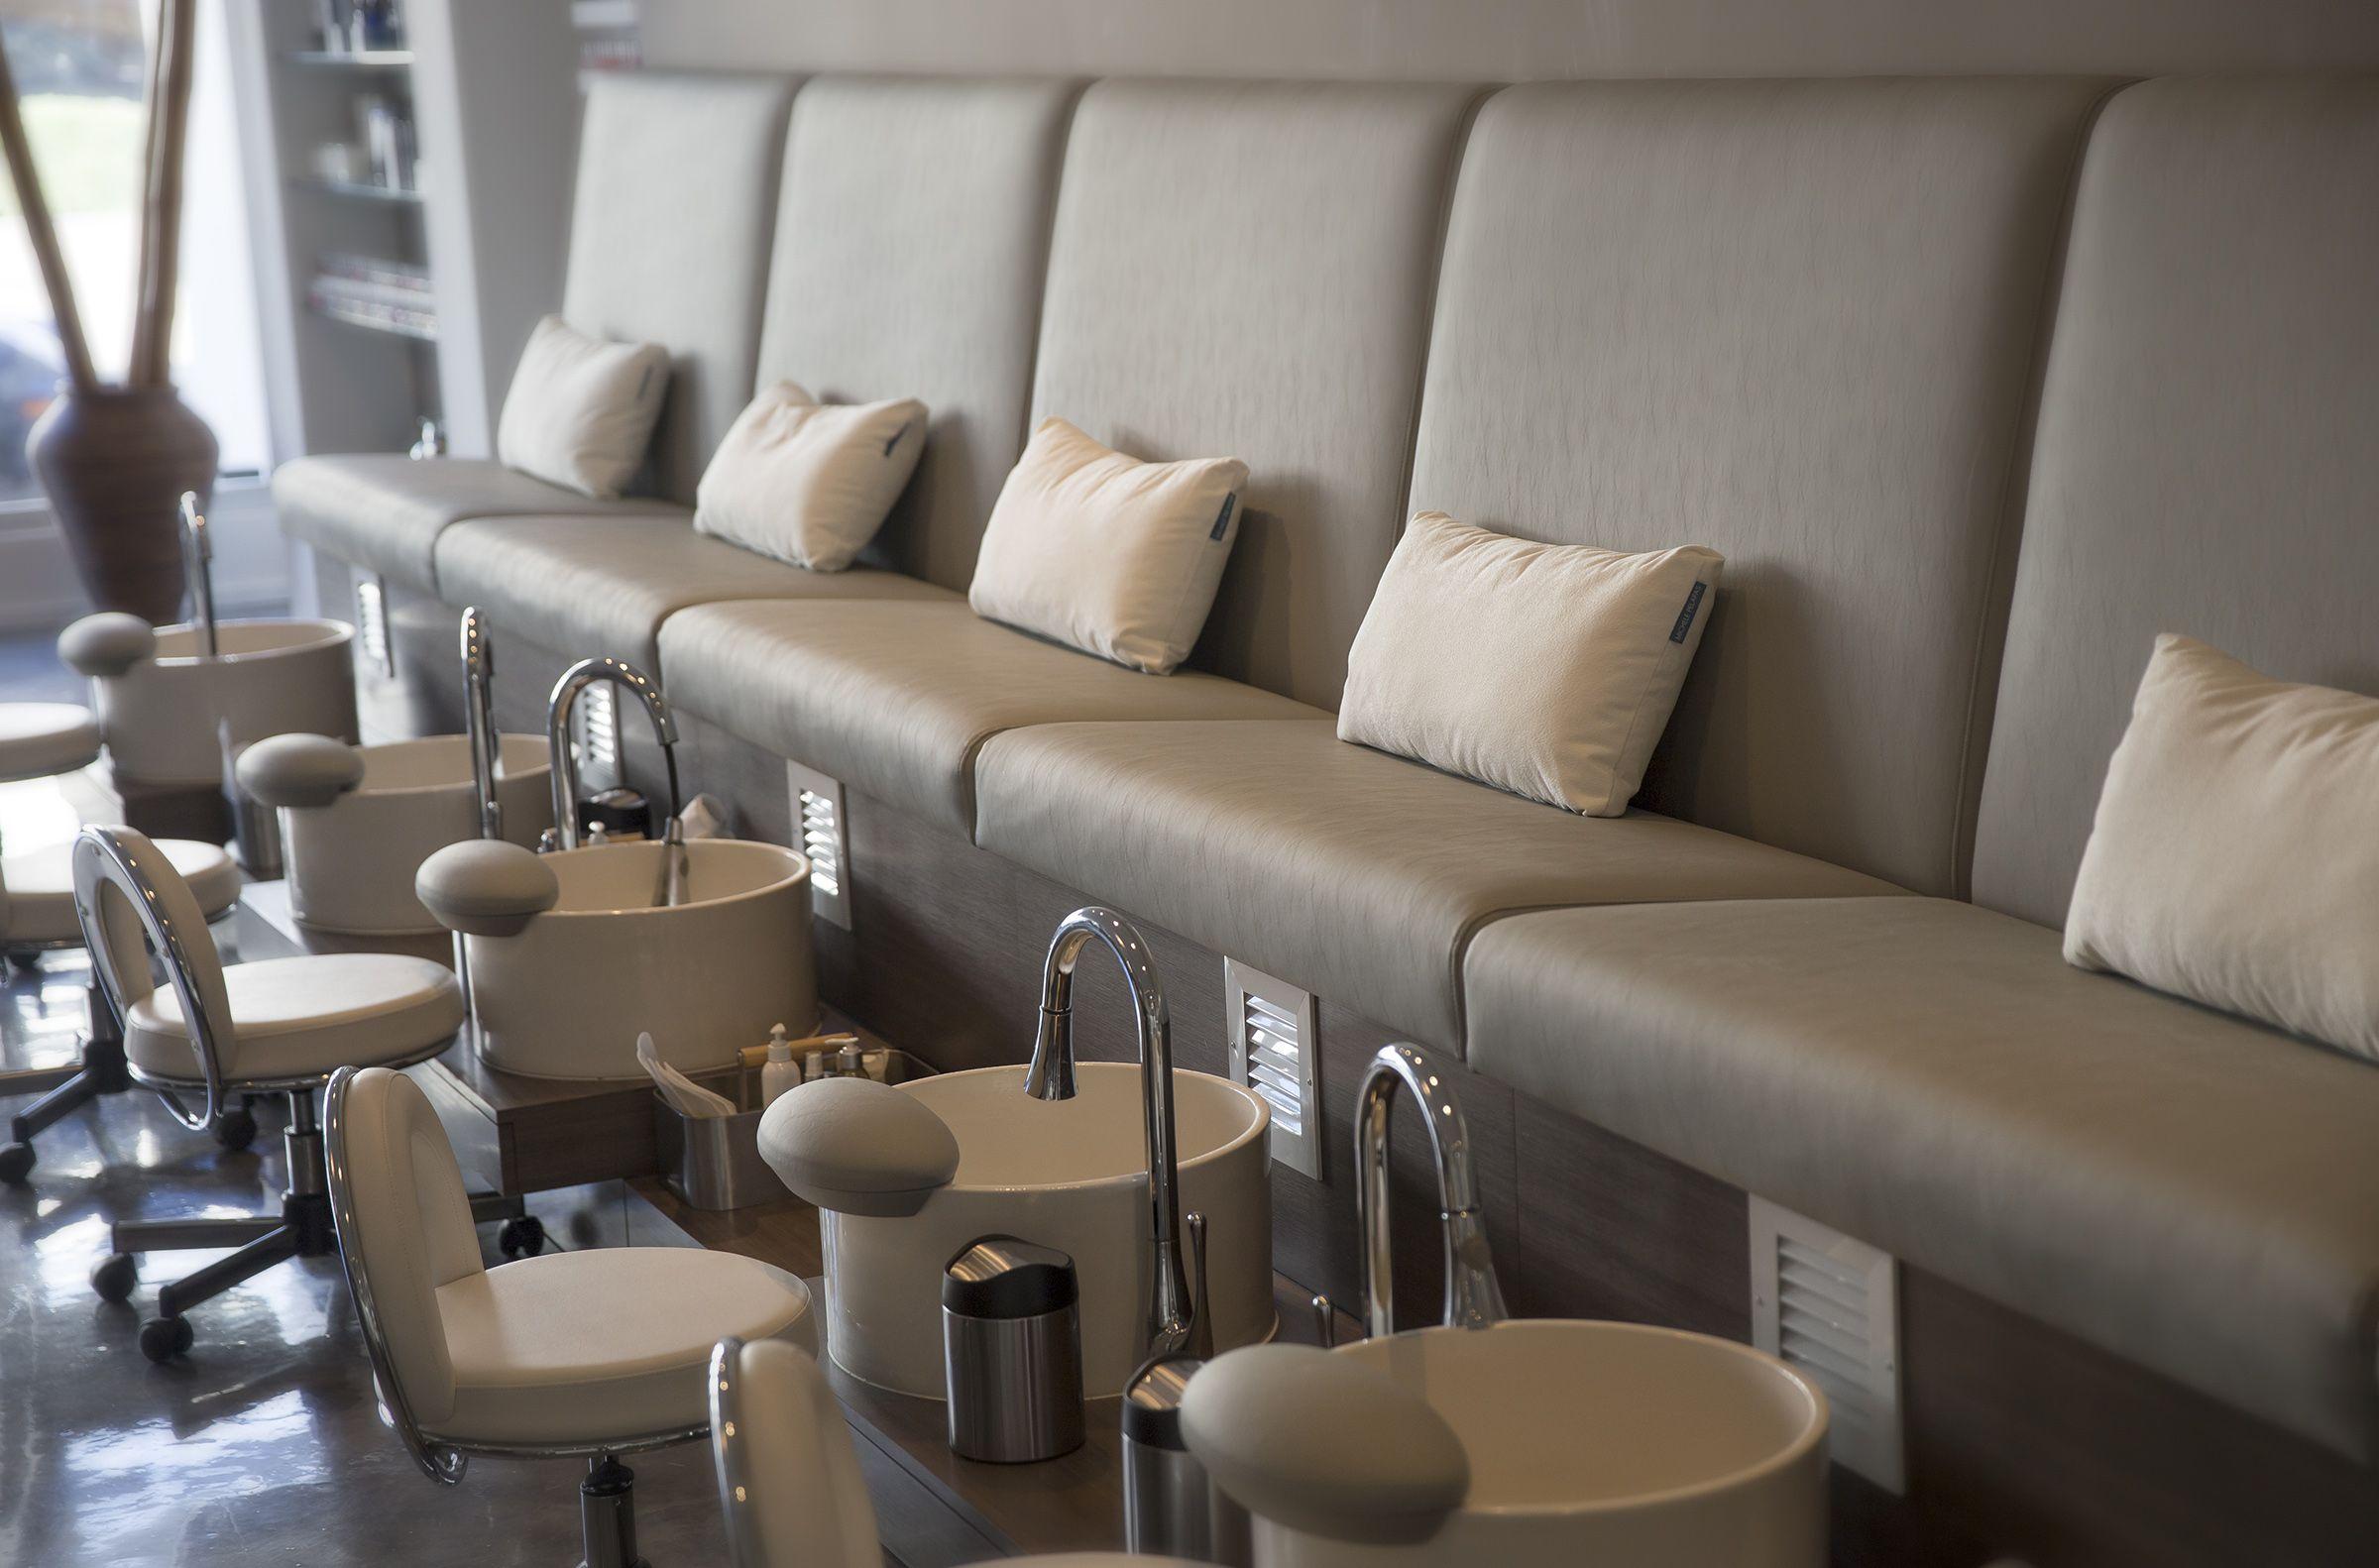 Serena Pedicure Bench With Mode Vessel Sink Salon Interior Room Setup Spa Rooms